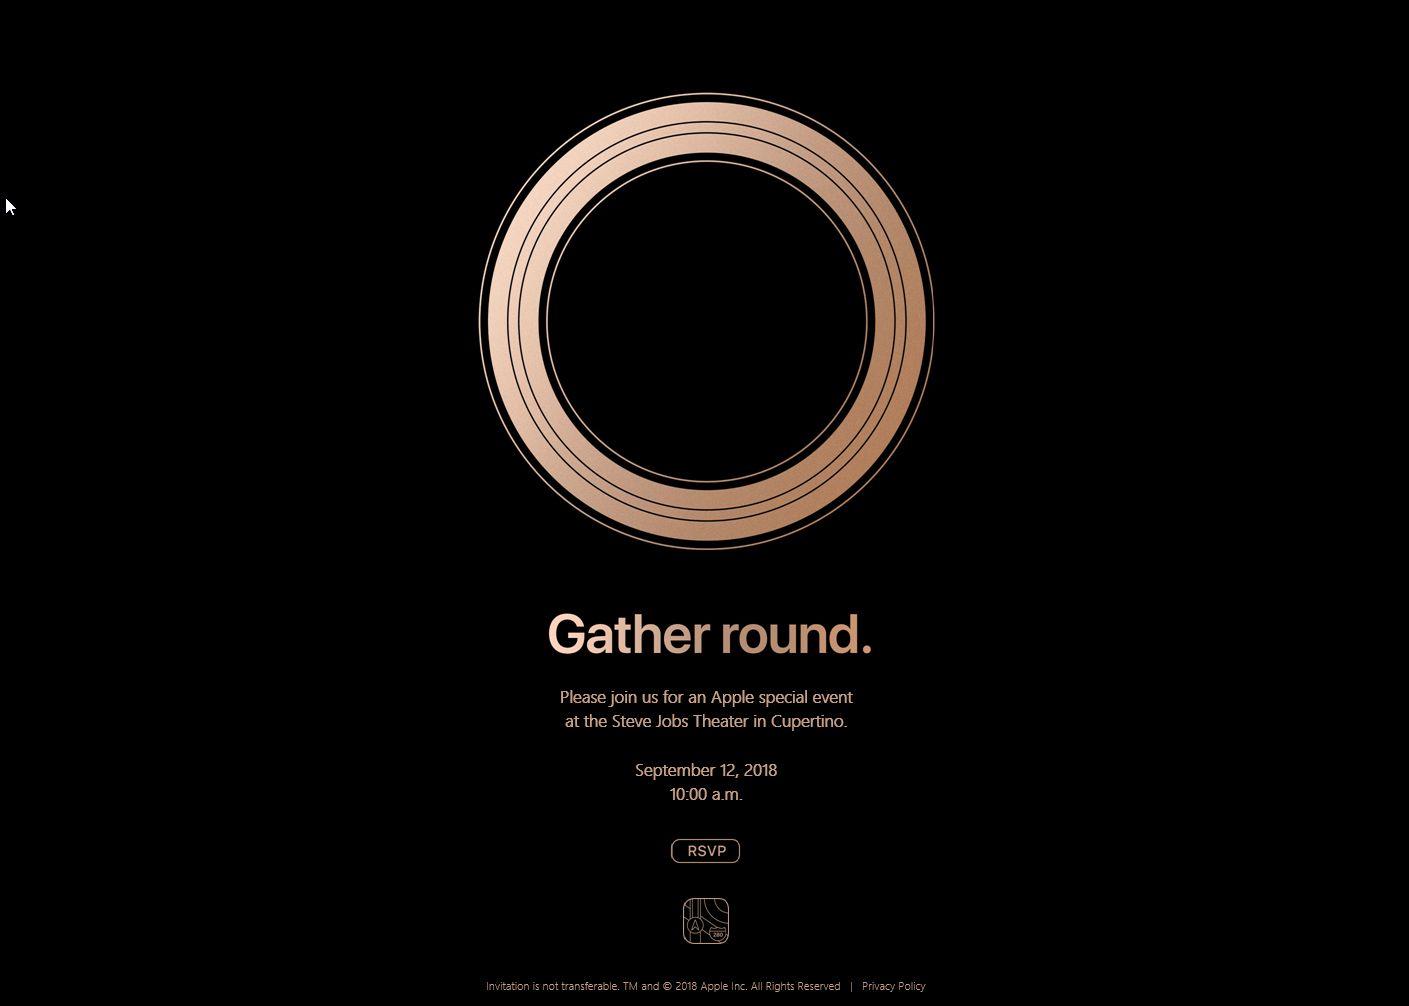 NUR ALS ZITAT Screenshot Apple-Event